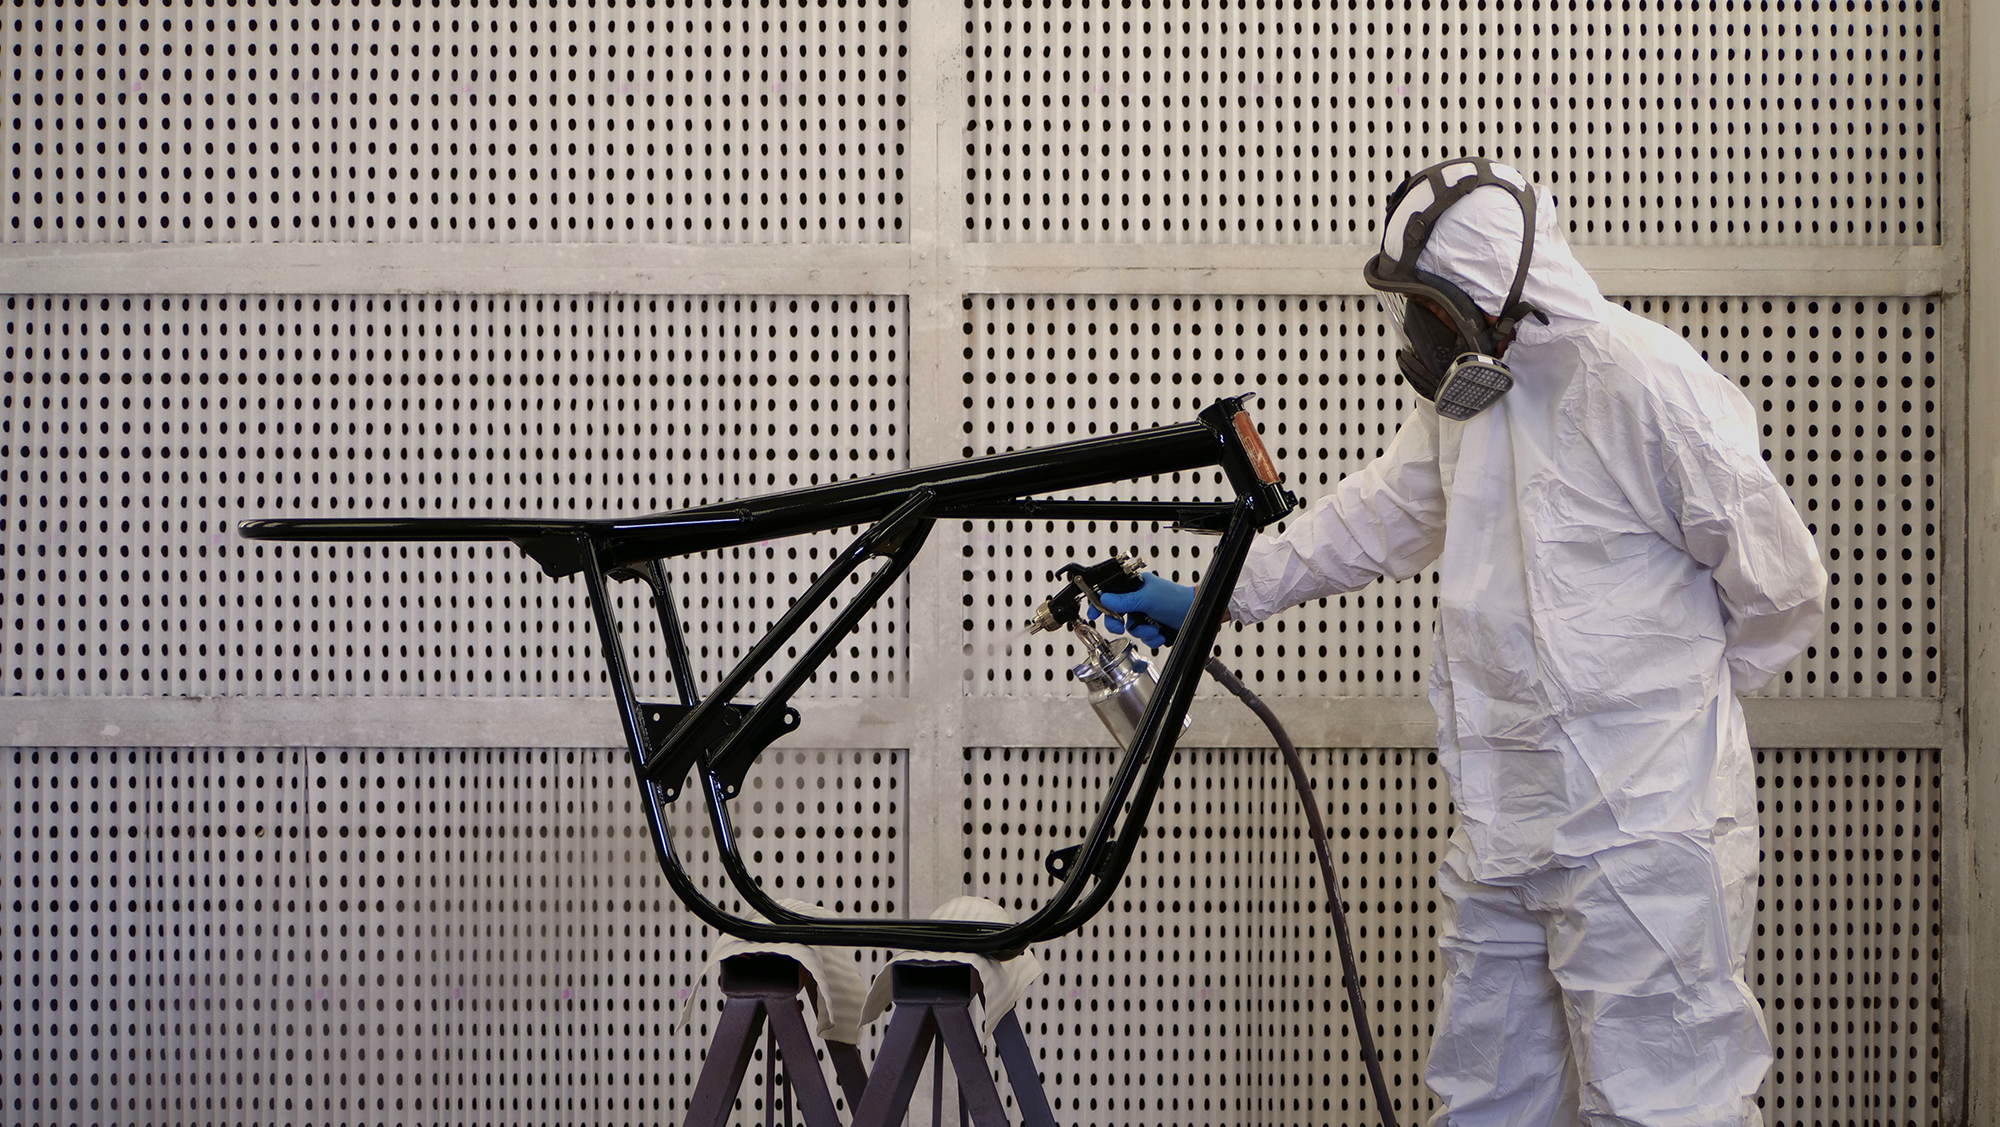 Person wet paint finishing on bike frame